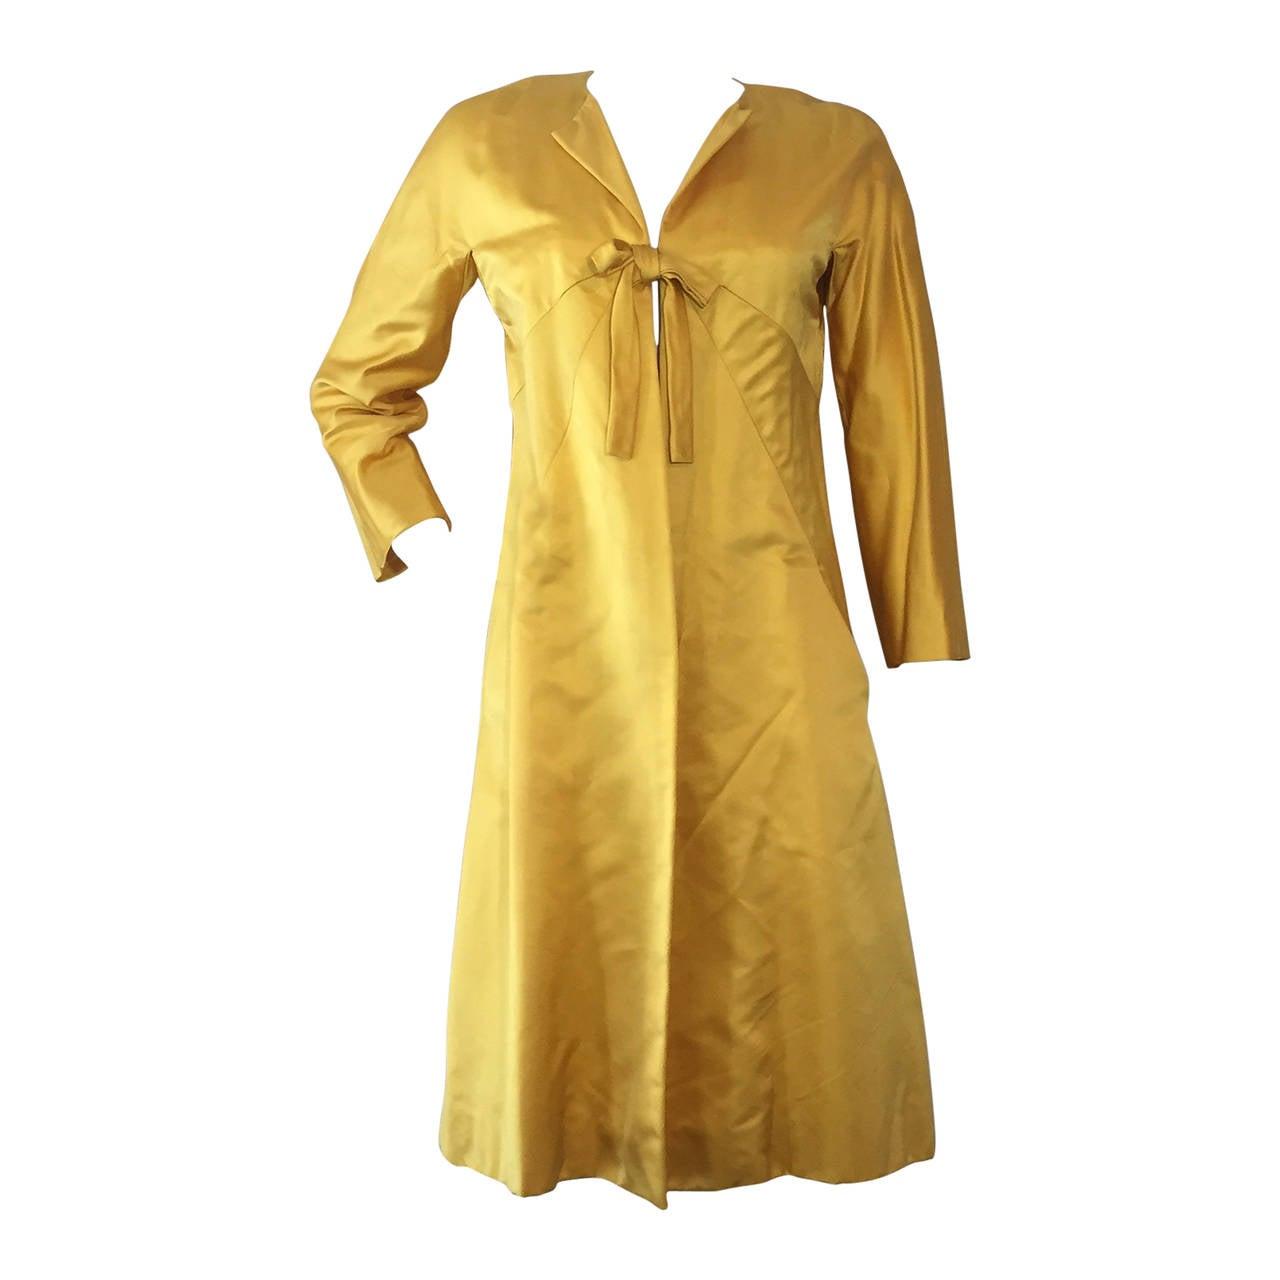 1960s Canary Yellow Silk Evening Coat with Sunburst Seaming